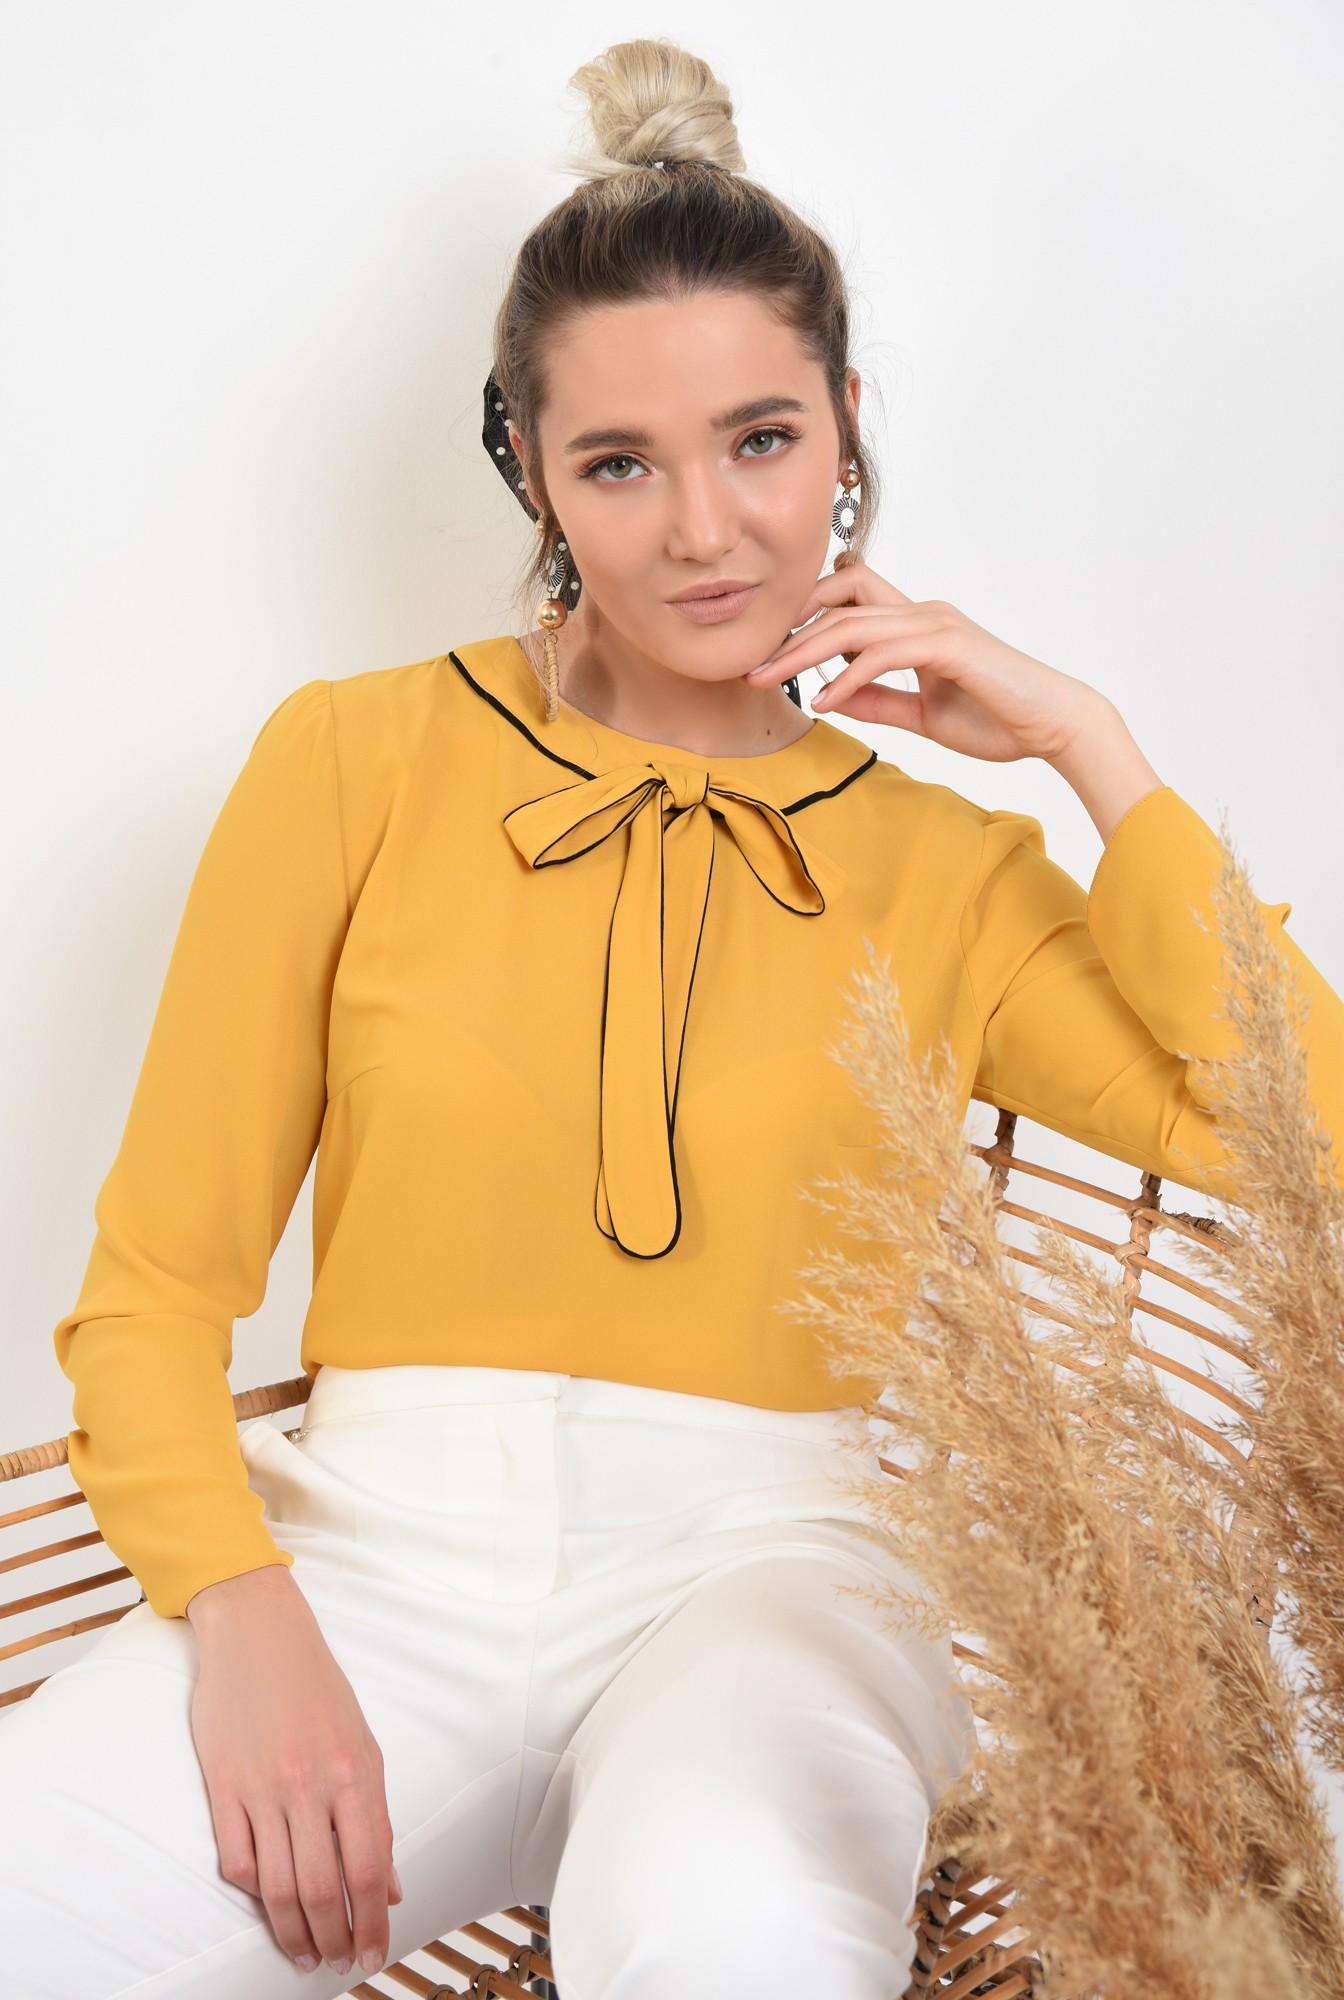 0 - bluza office, maneci lungi, funda cu borduri contrastante, mustar, bluza de primavara